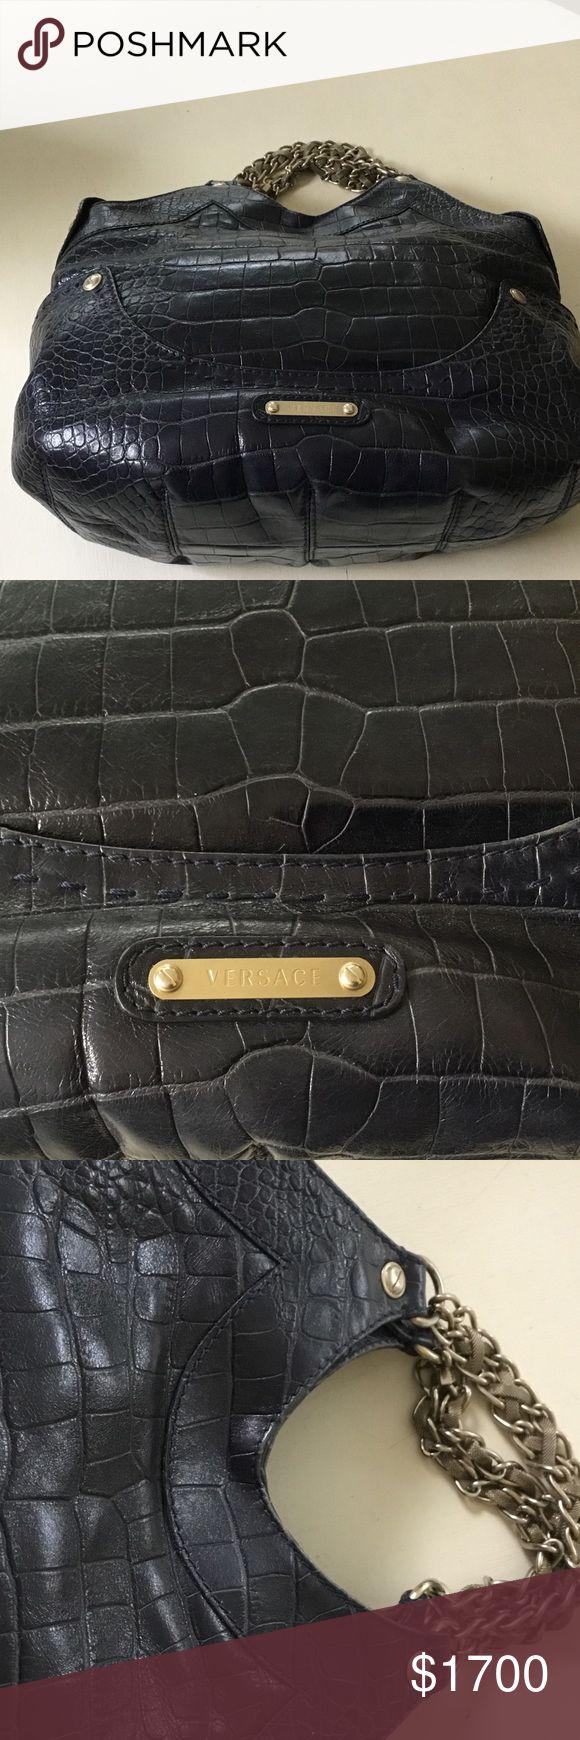 Versace Designer Handbag Navy Crocodile Silver Versace Designer Handbag, with original tags, Made in Italy.  Navy crocodile embossed body with a shoulder strap and silver mesh handles.  Original dust cover bag with Versace label.  Nordstrom designer handbags purchased. Versace Bags Satchels